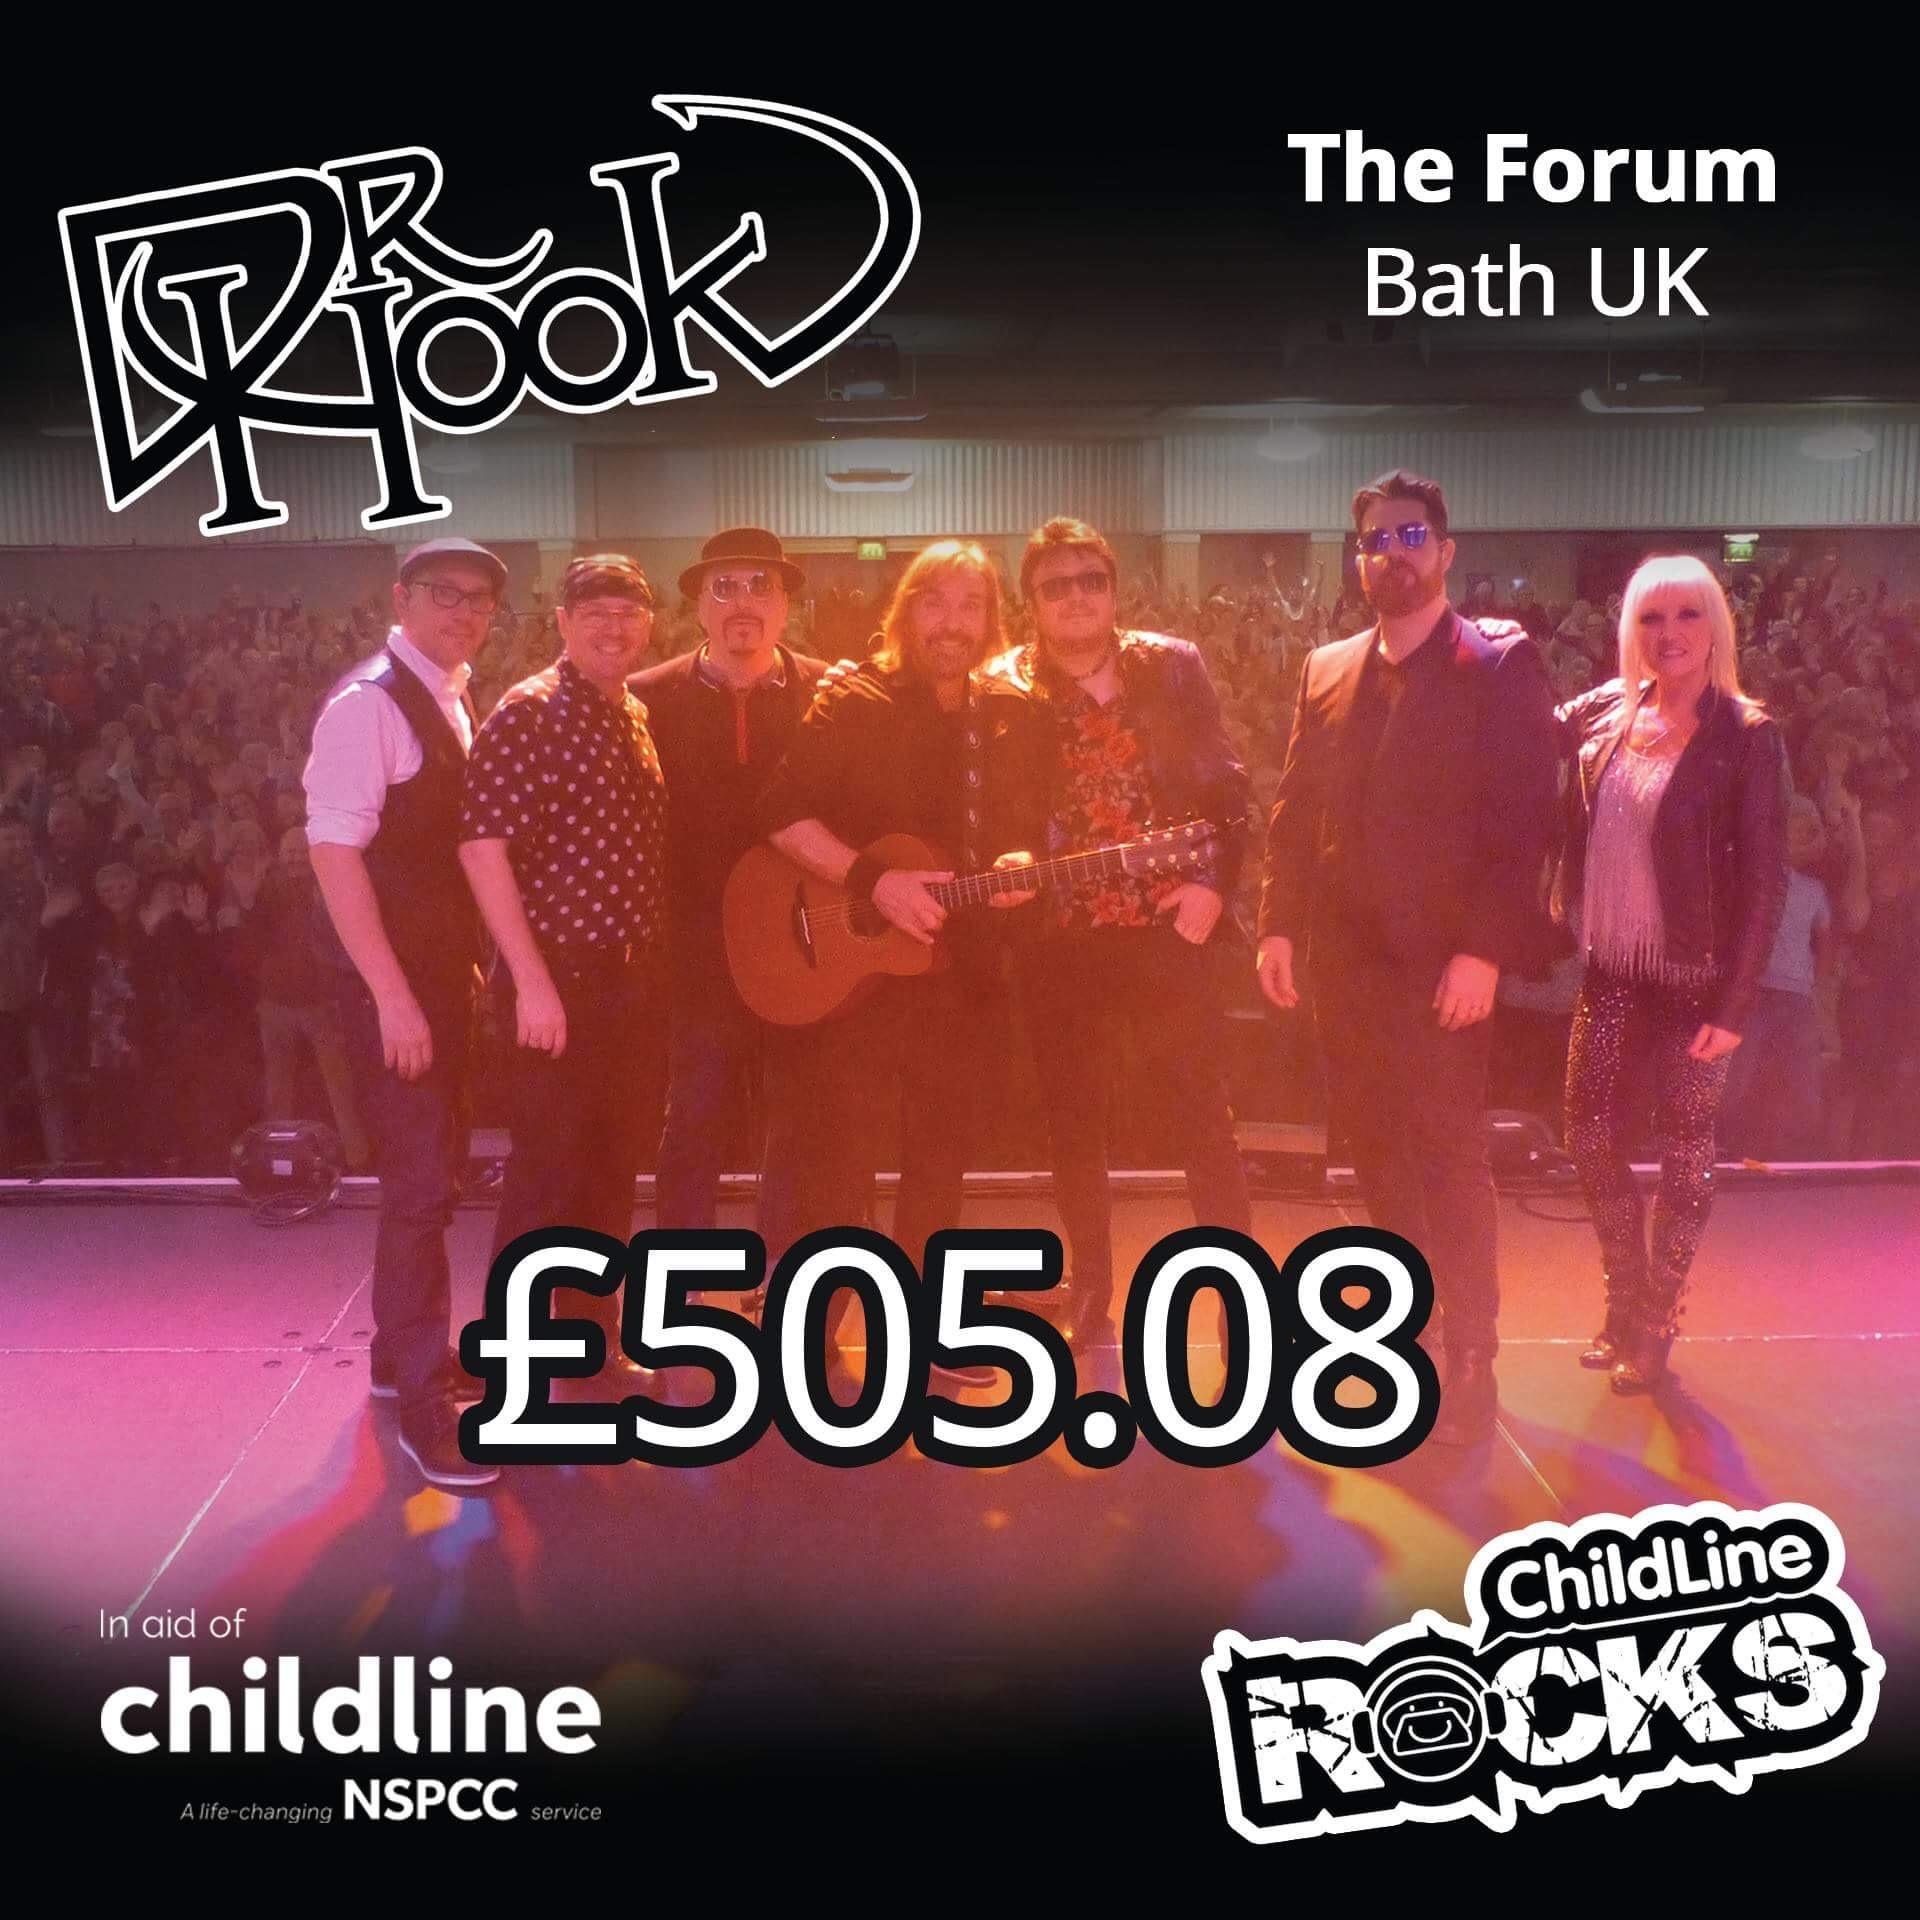 Dr Hook   UK & IE Tour   2017   Fundraising For NSPCC Childline   Bath UK